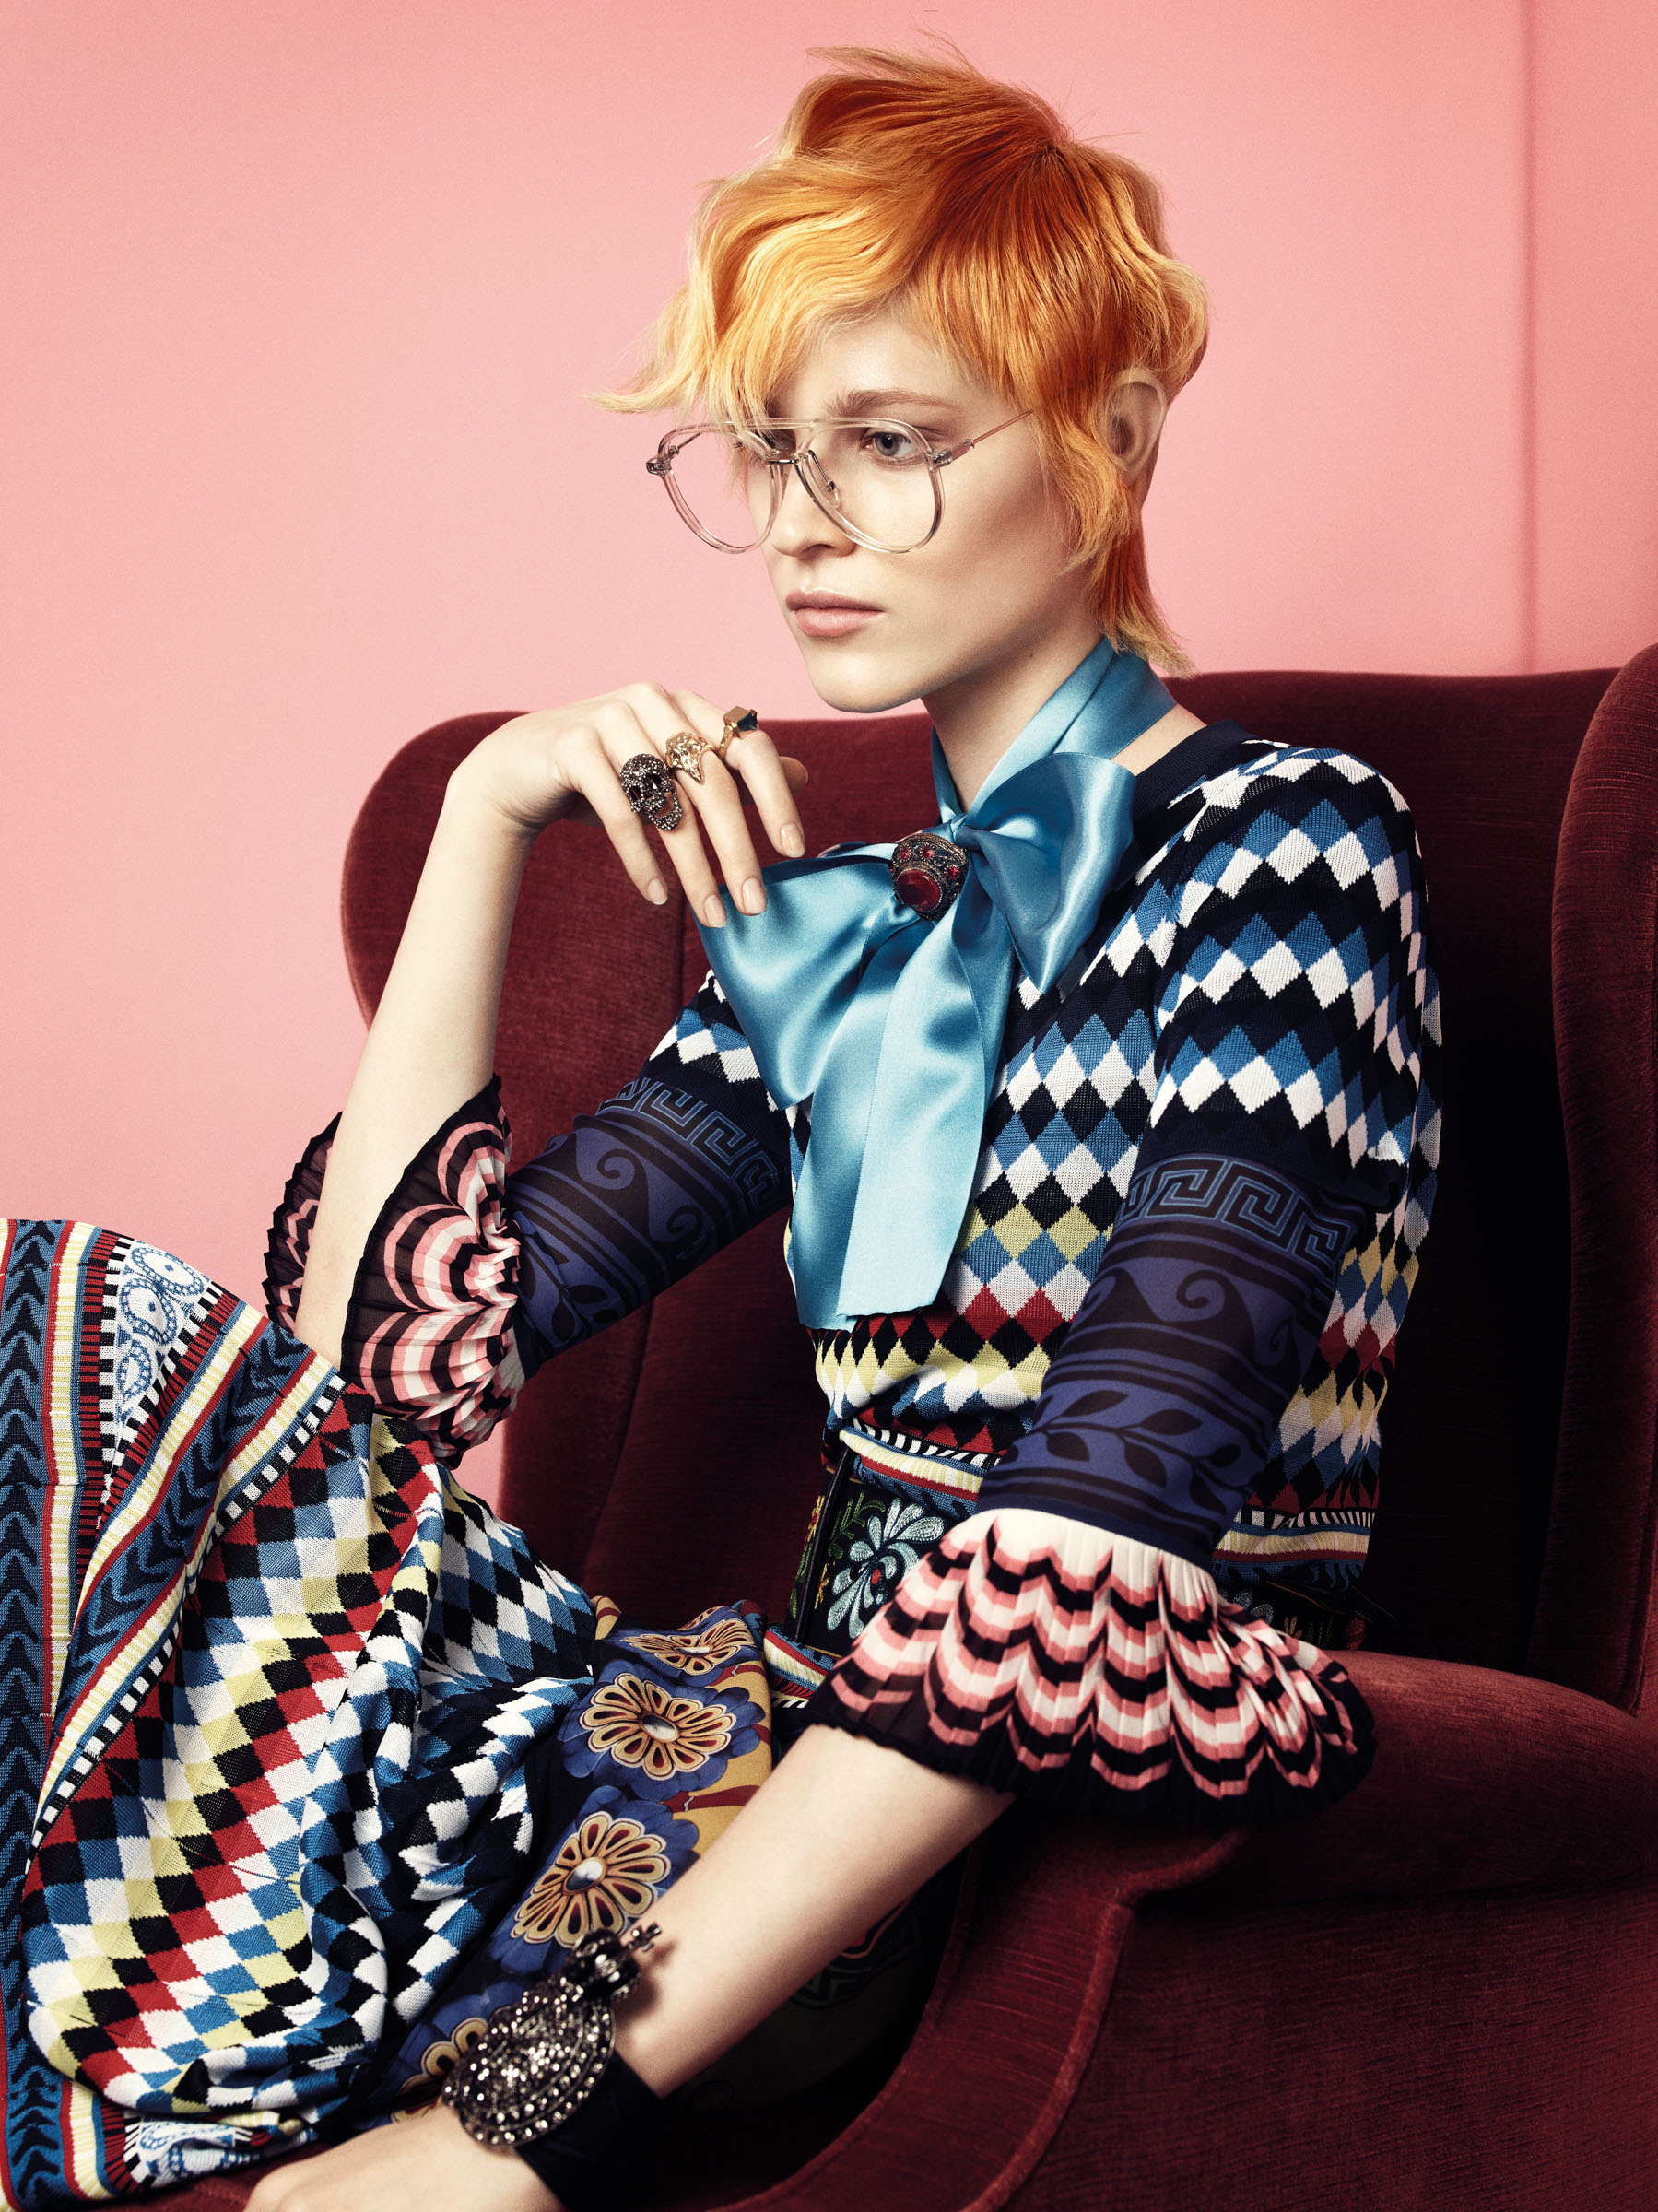 Jack-Eames-Toni-Guy-Hair-Beauty-Photography-Campaign-Pink-Fashion-03.jpg